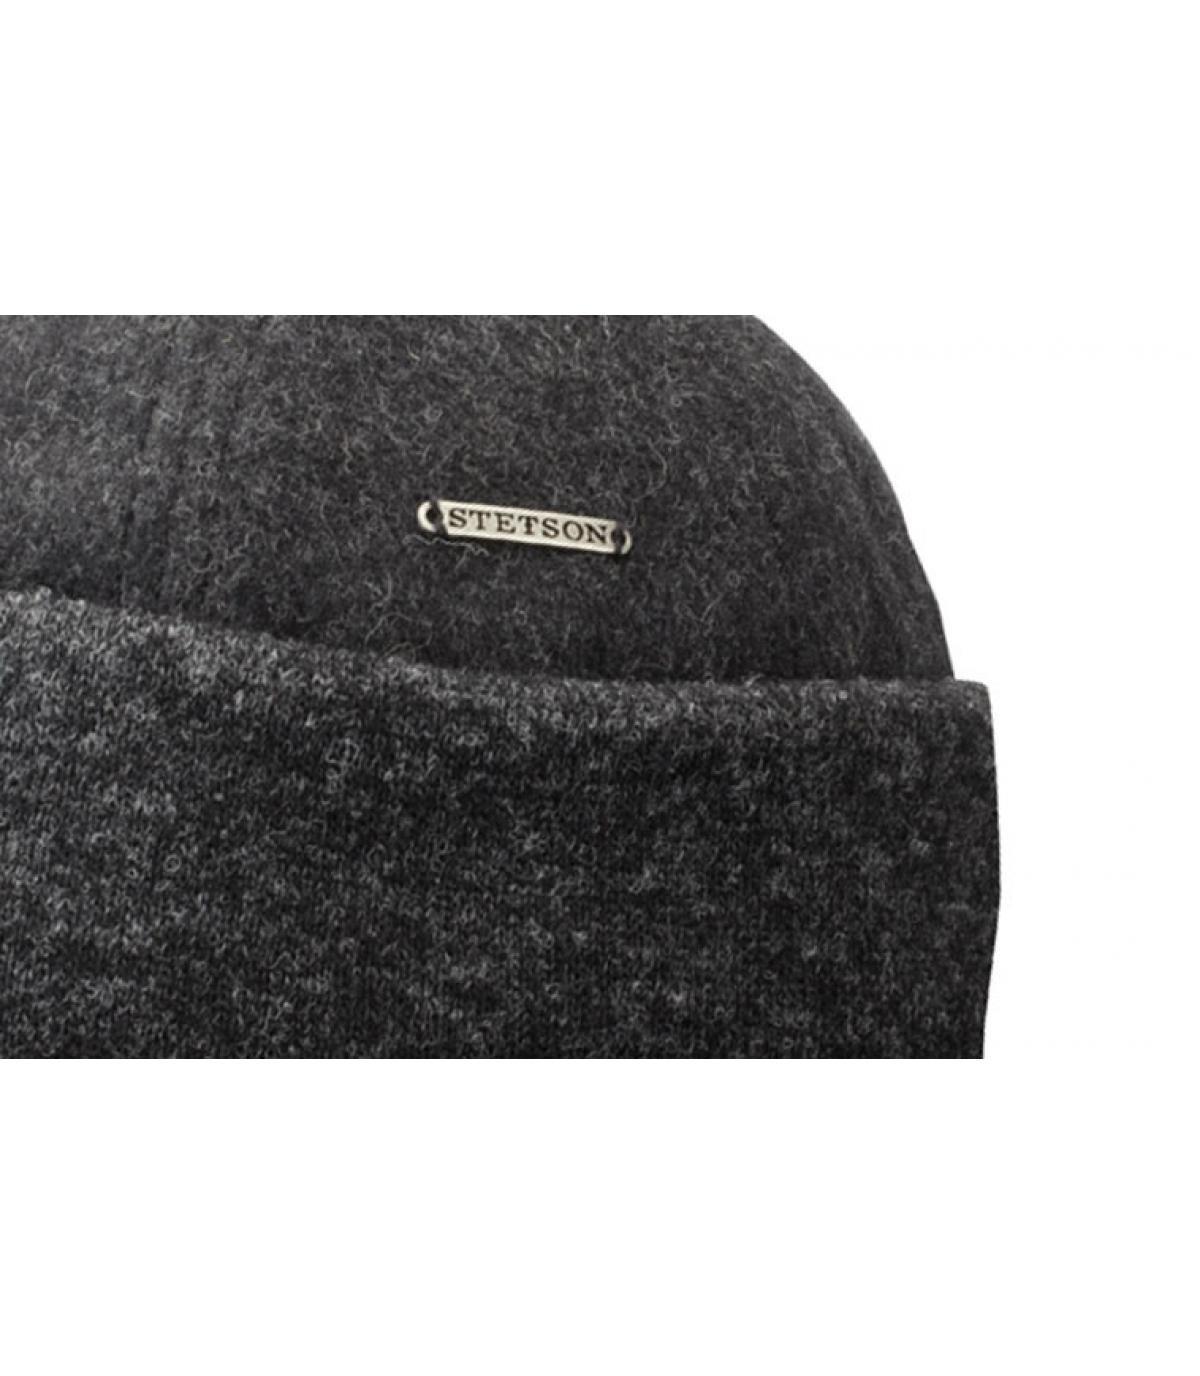 Details Docker Wool Cashmere grey - Abbildung 3